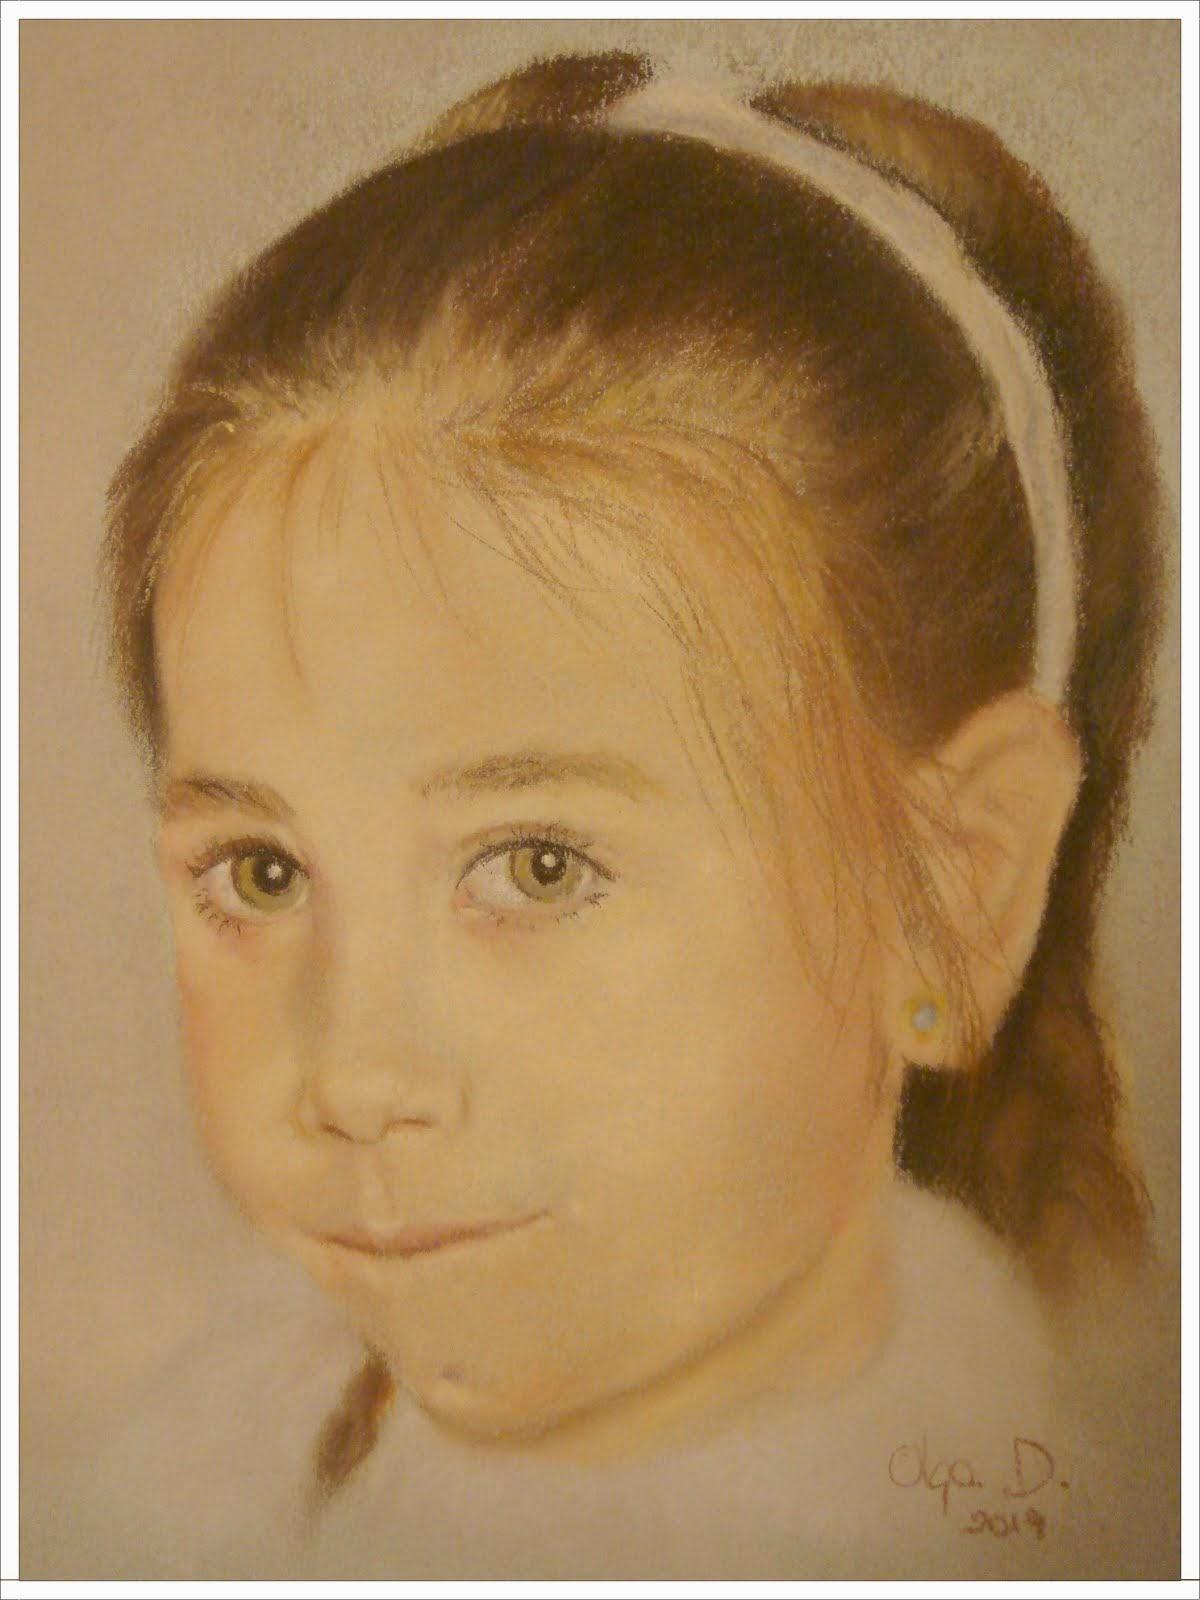 A mis seis años